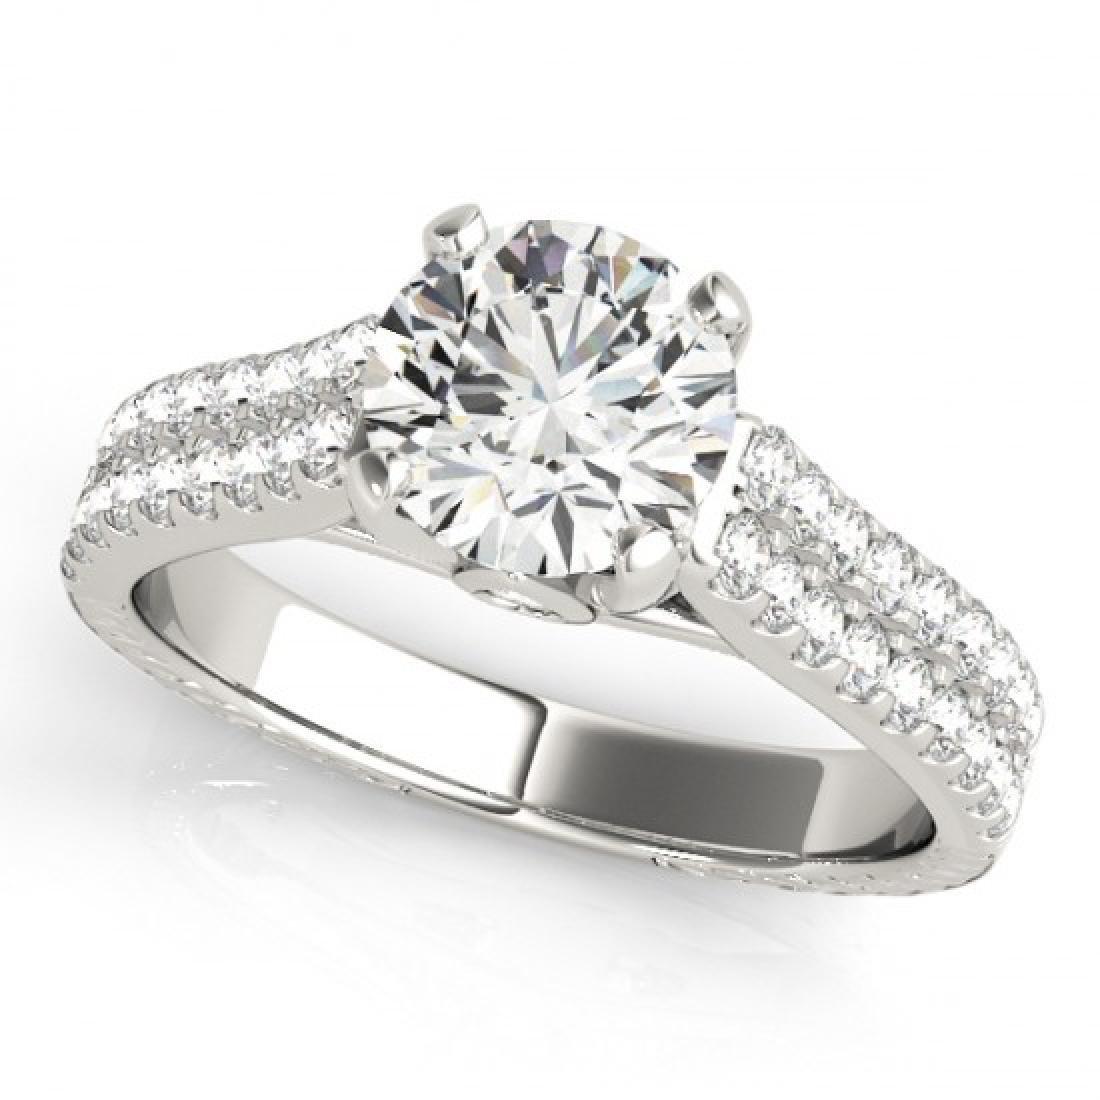 2.11 CTW Certified VS/SI Diamond Pave Ring 14K White - 2